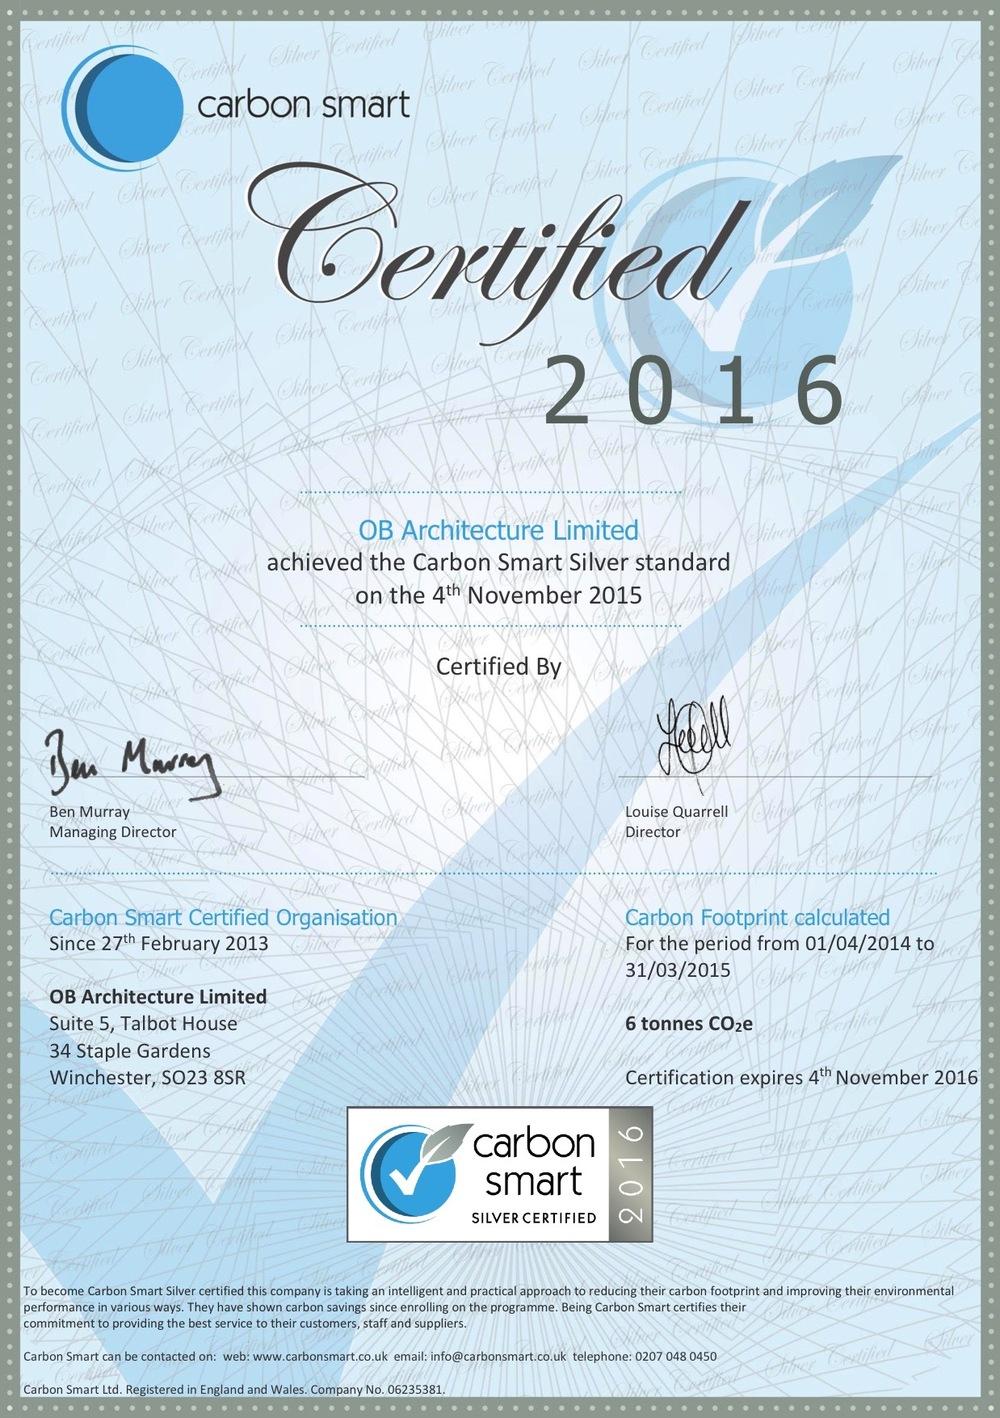 OB_Architecture_Carbon_Smart_Silver_Standard